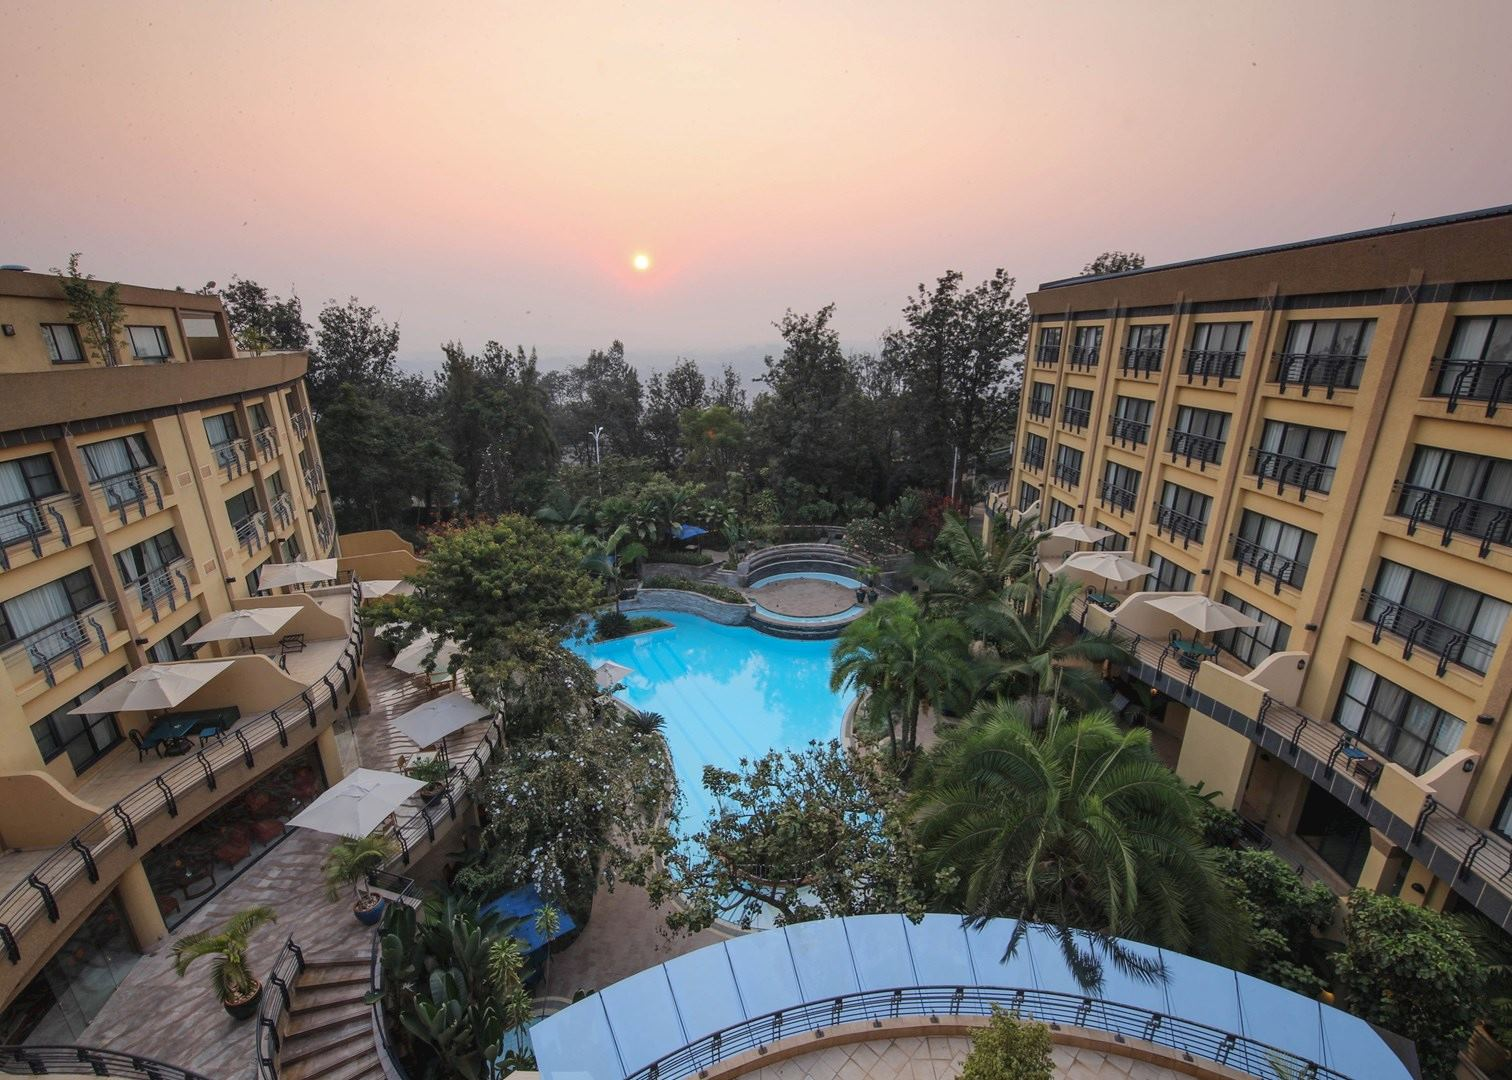 Photo: Kigali Serena Hotel, courtesy of Kigali Serena Hotel